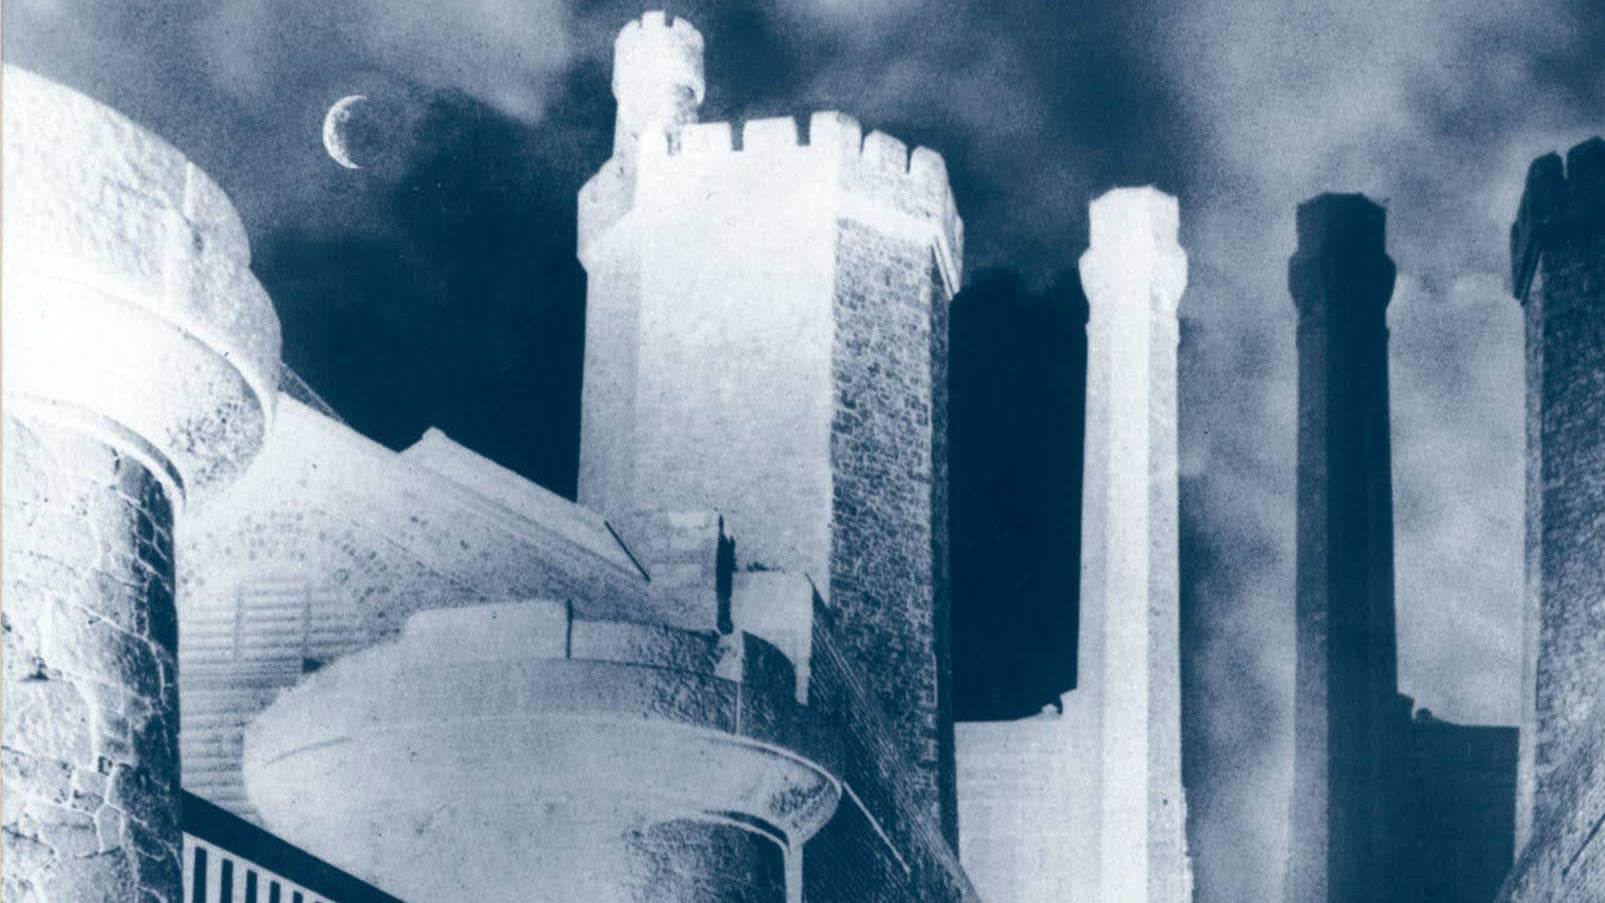 Neil Gaiman's Take On Mervyn Peake's Gormenghast Fantasy Trilogy Finds A Home